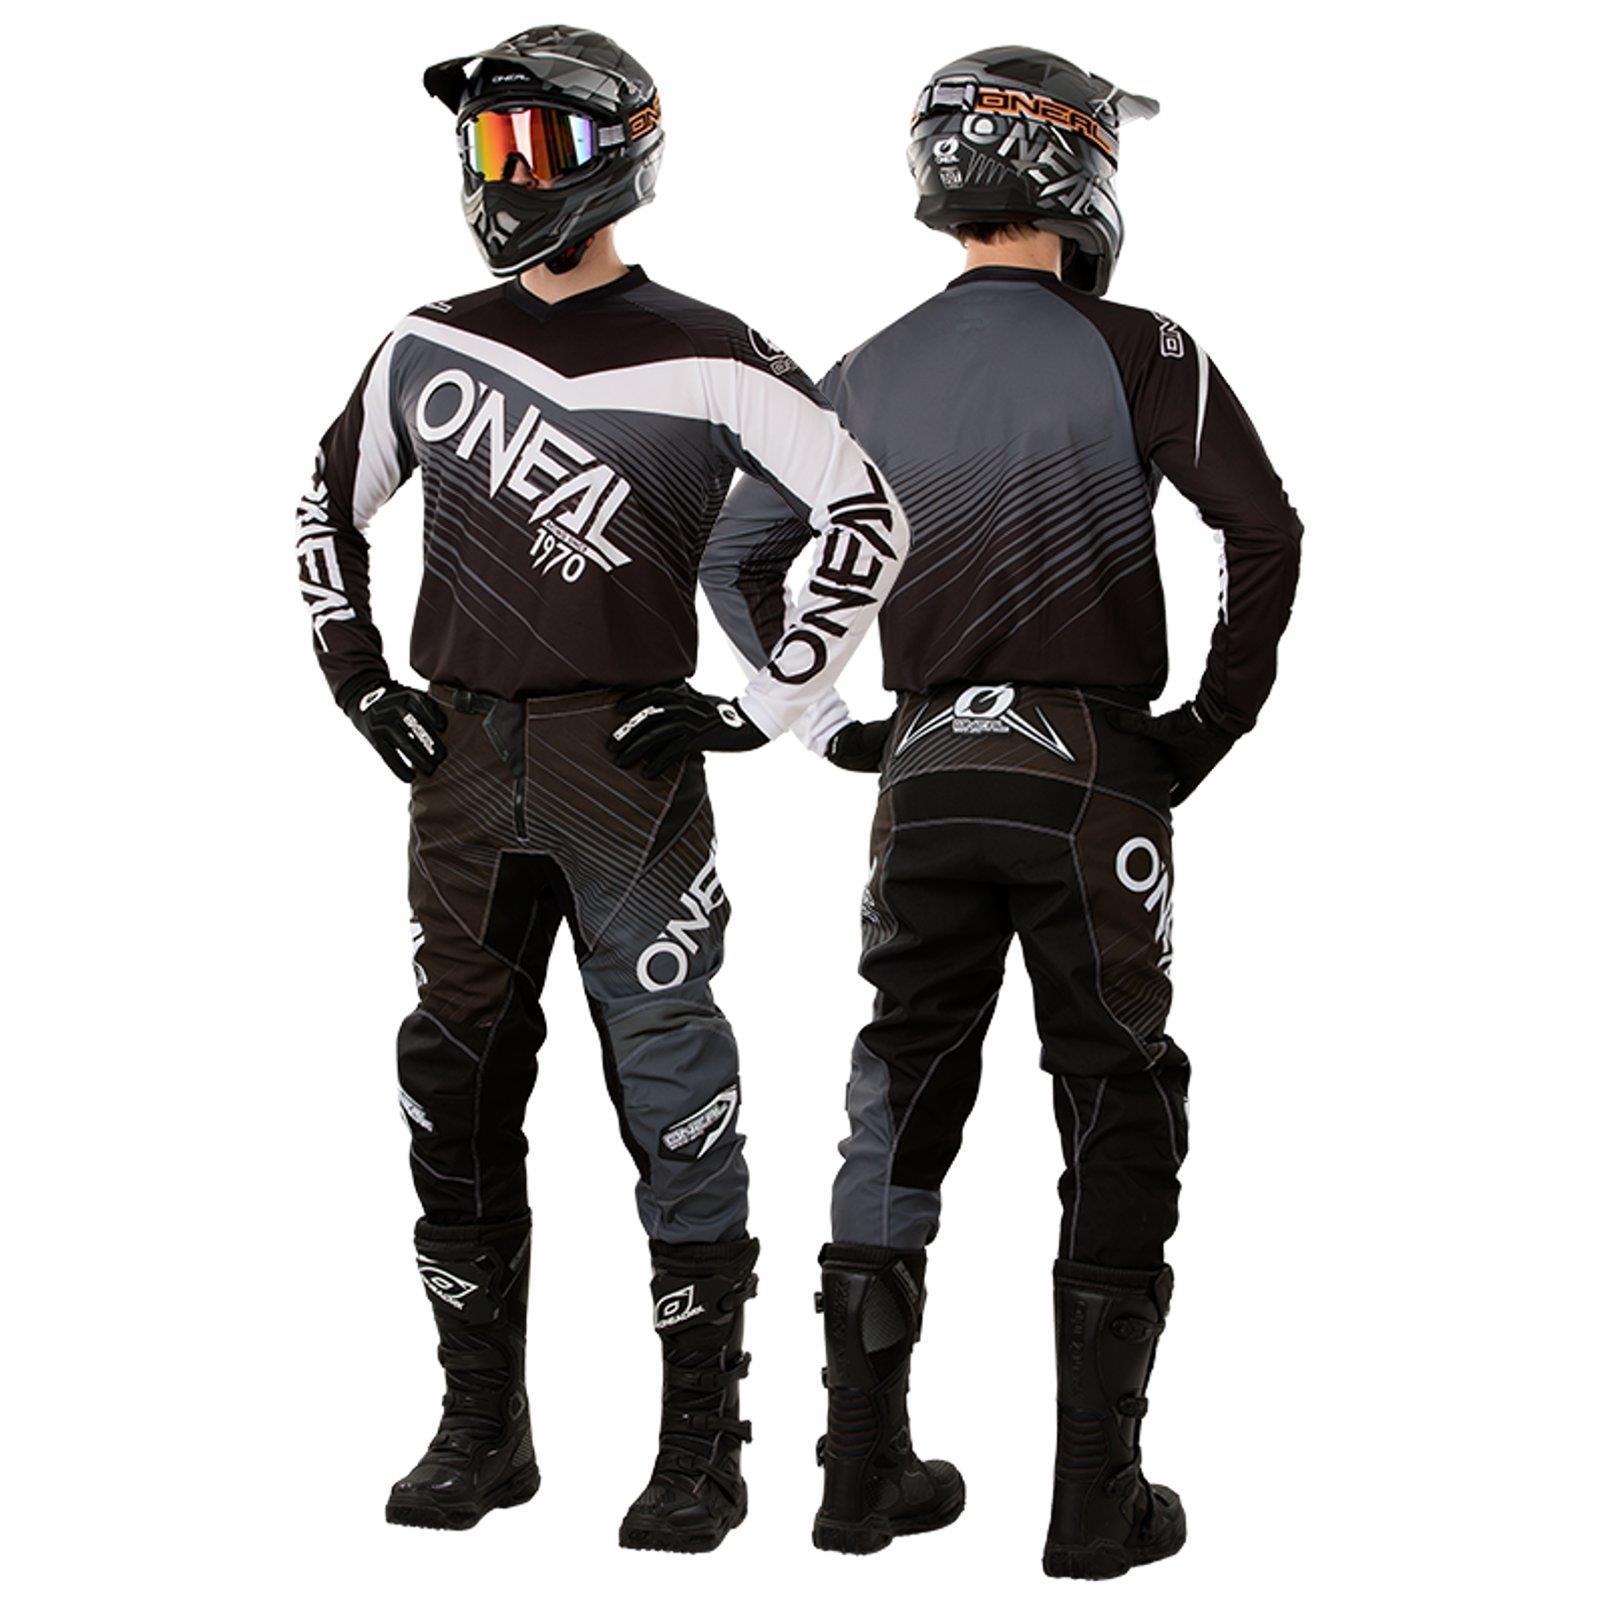 ONeal Element Element ONeal Racewear Jersey Hose Erwachsene Kinder Motocross Downhill Enduro 6313bc